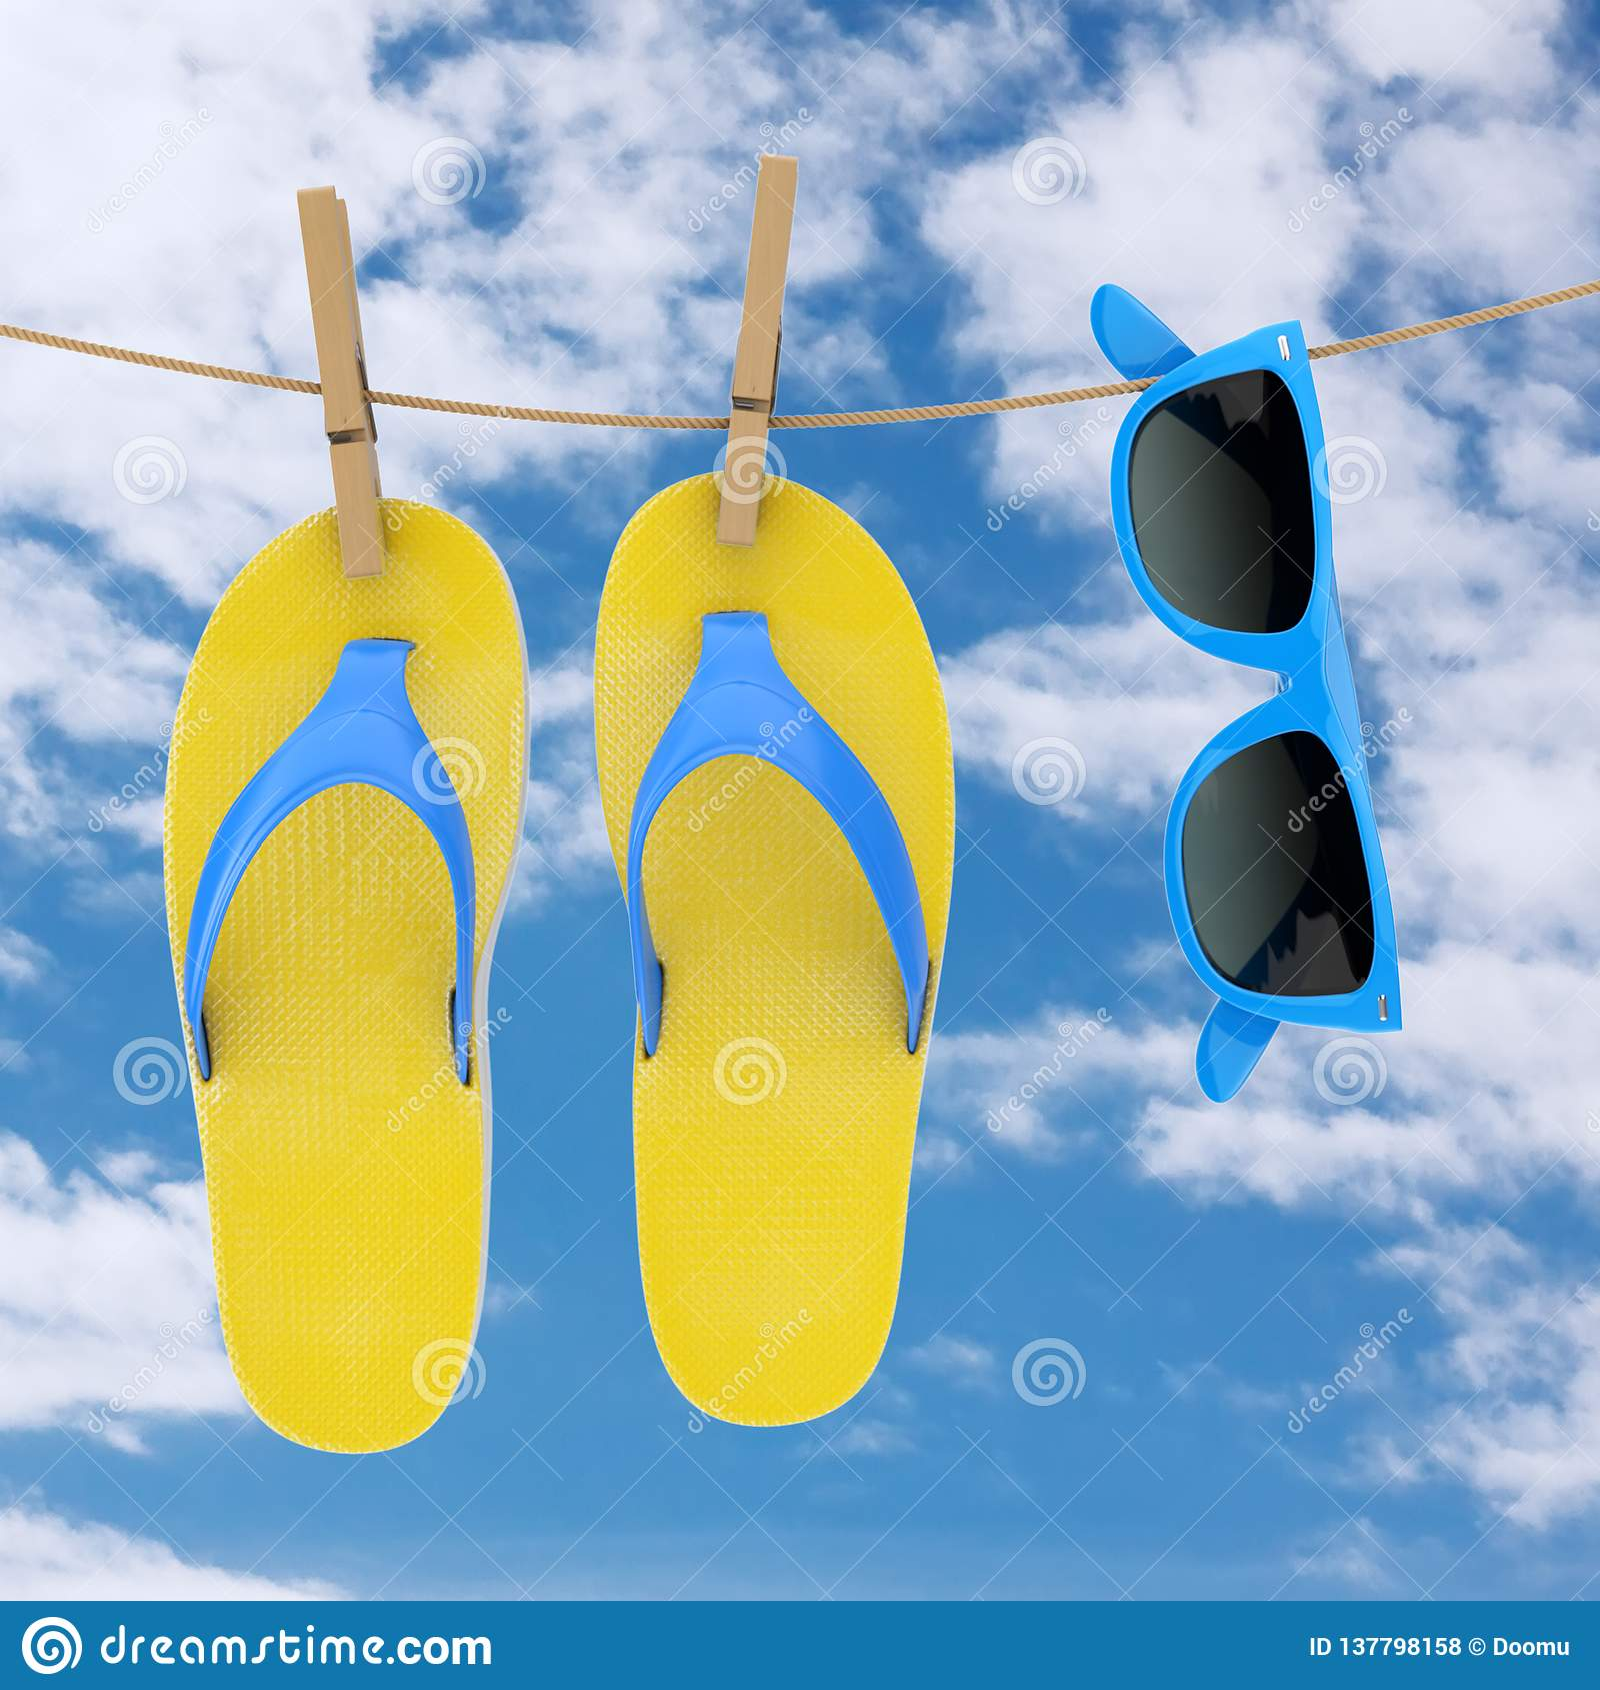 a3de6dabec1fa6 Colorful Modern Flip Flops with Blue Sunglasses Hanging on Clothesline on a  blue sky background background. 3d Rendering